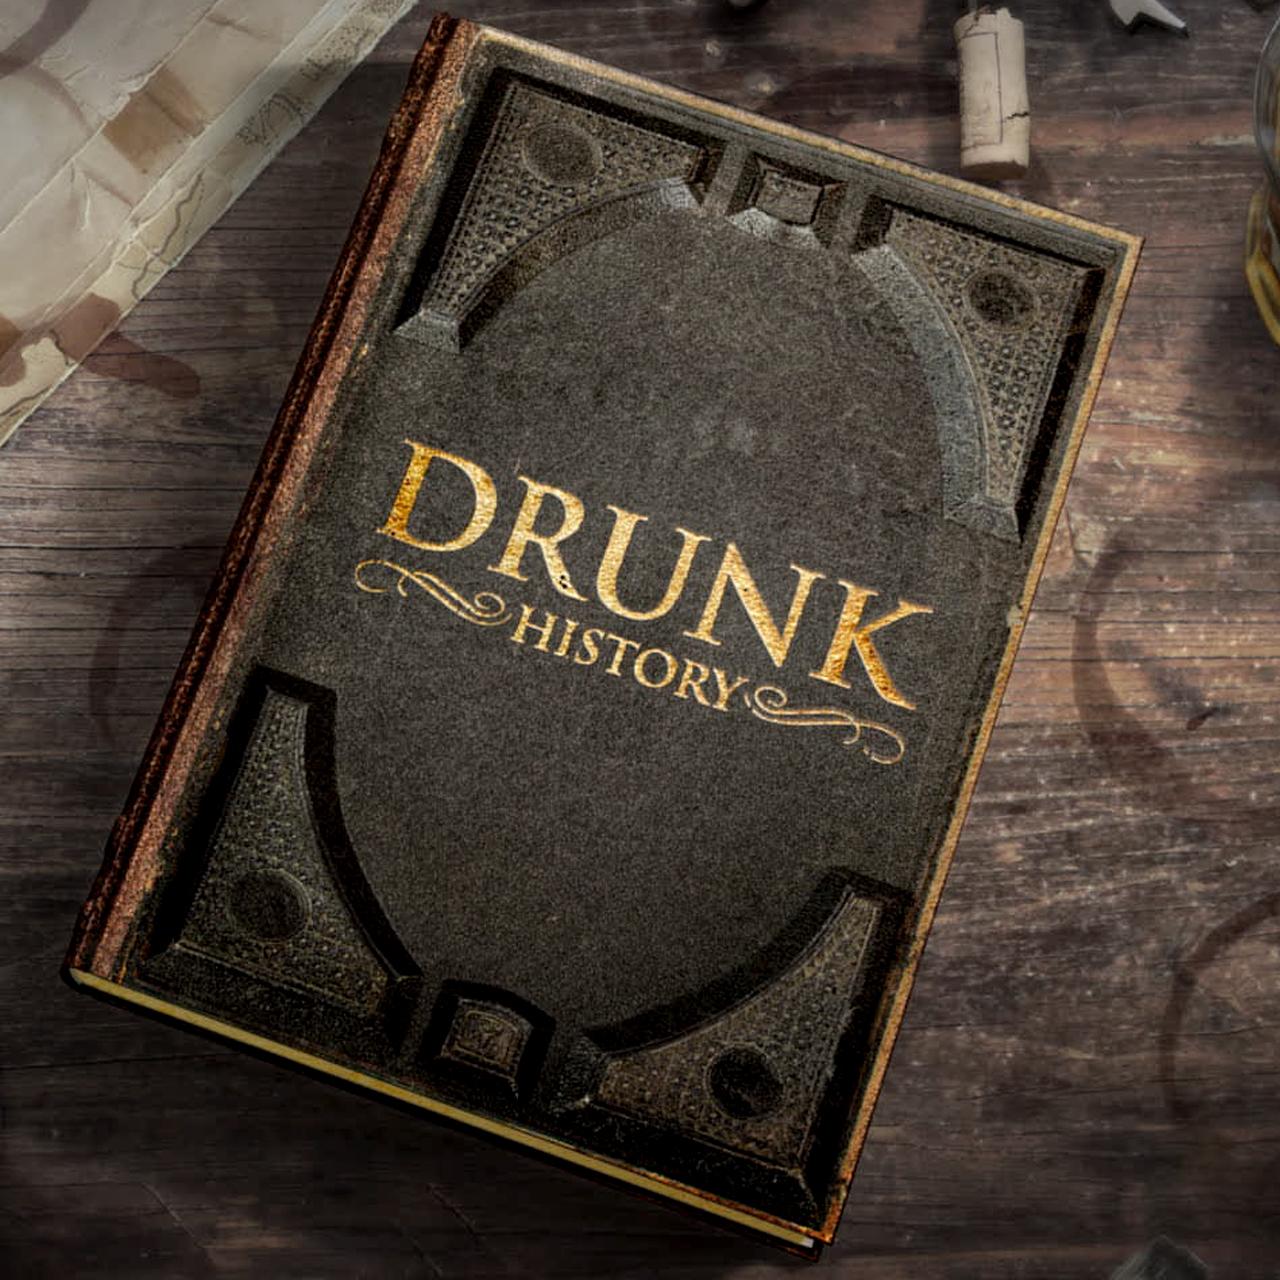 Drunk History (2013 series)